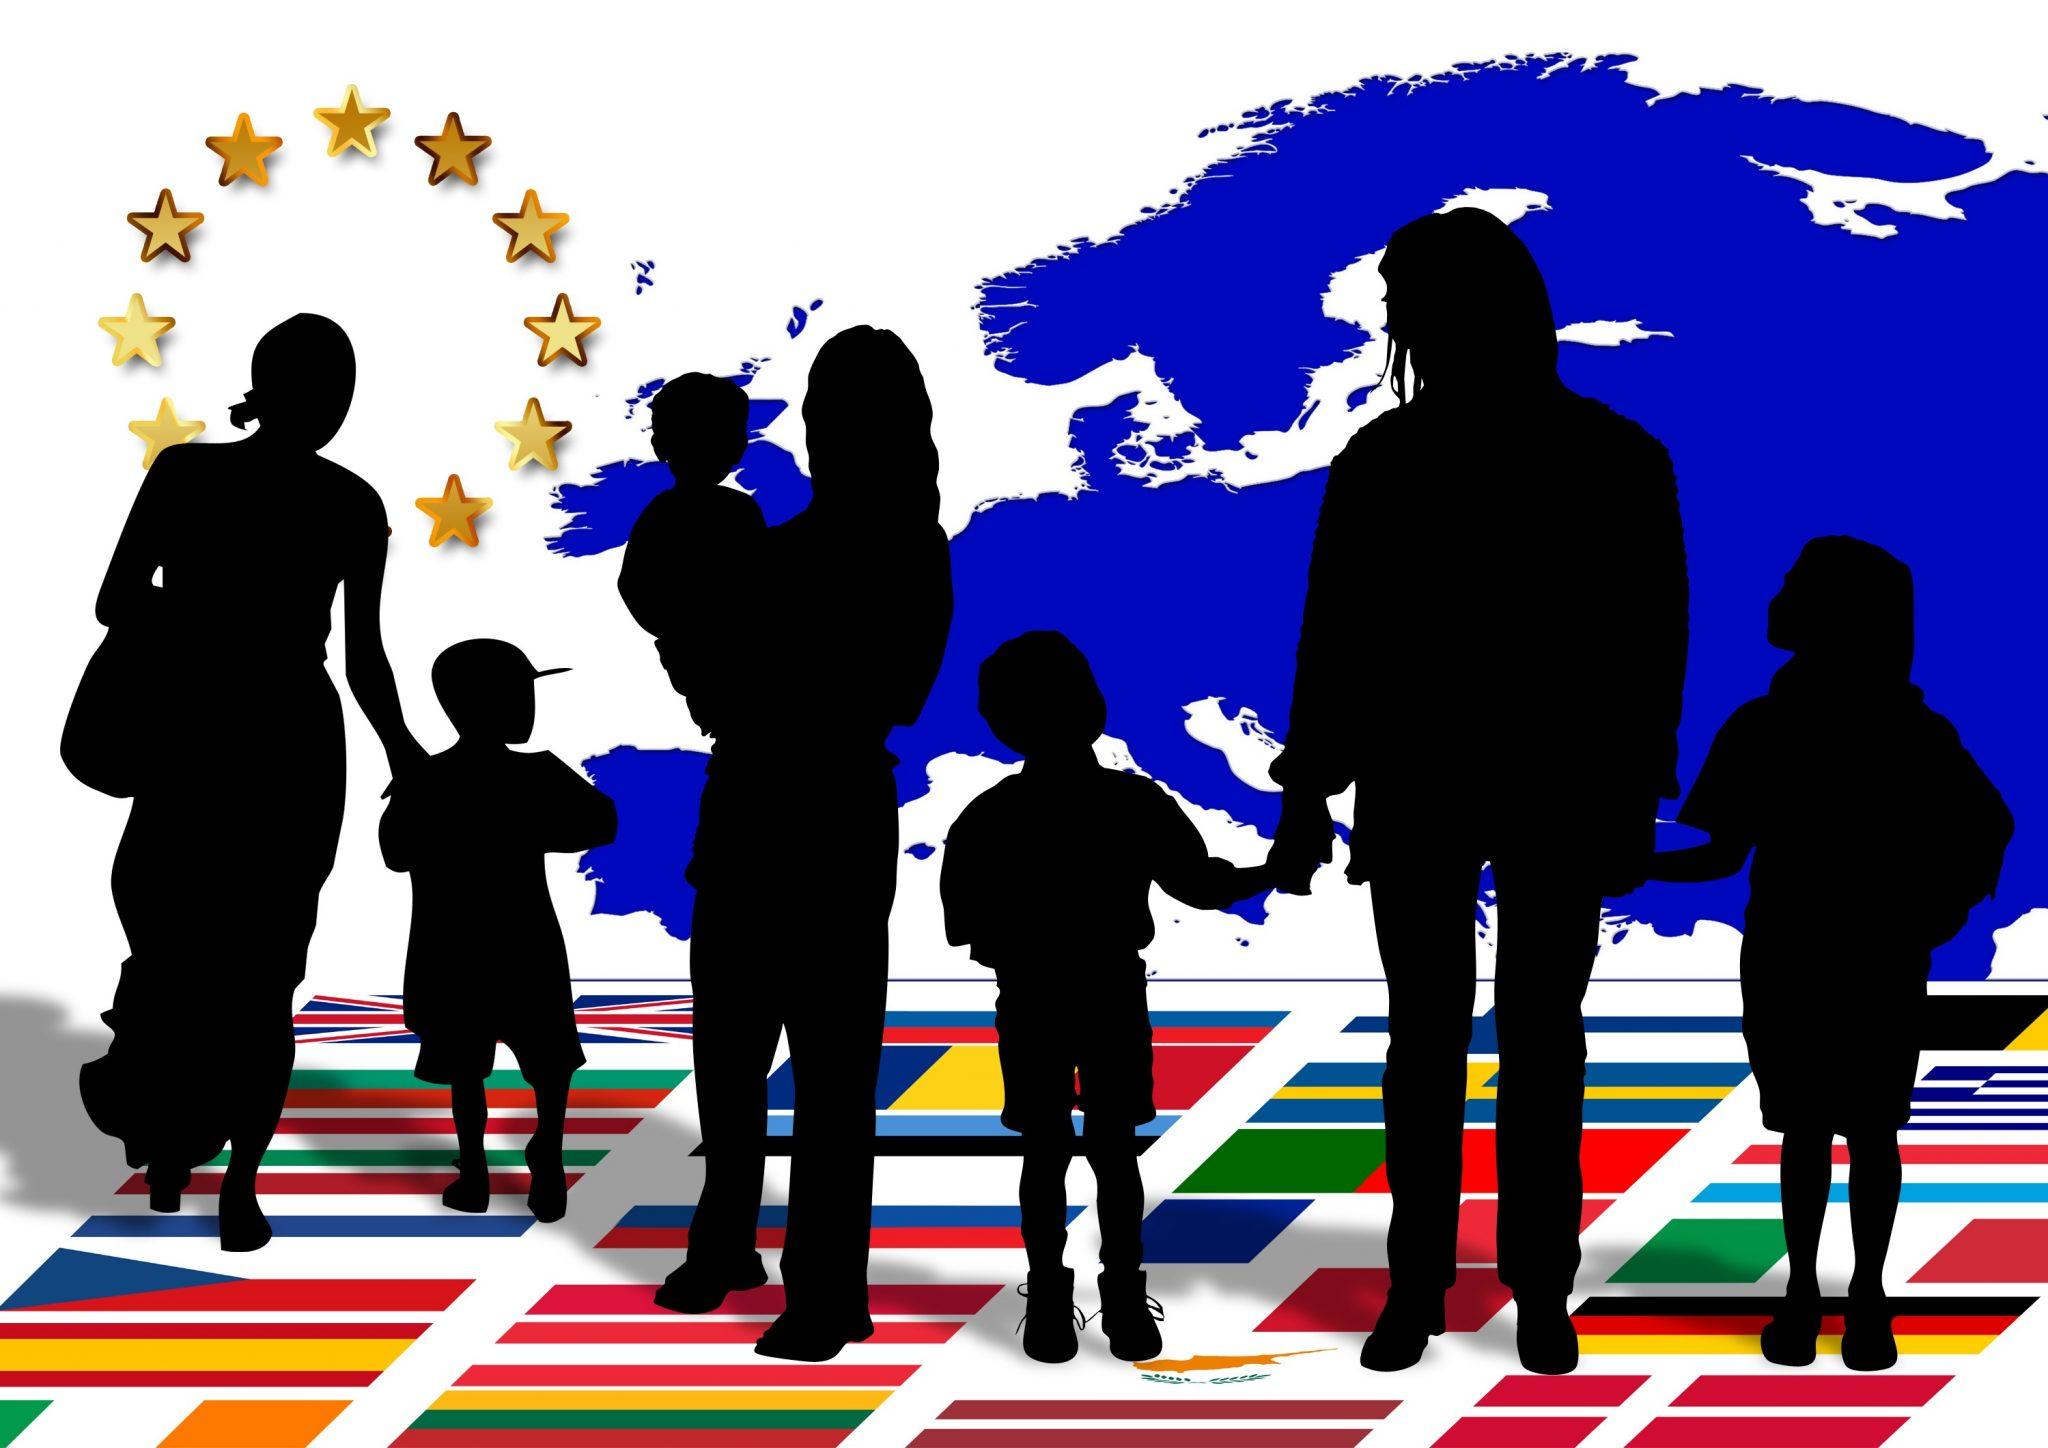 L'Europe sociale doit progresser